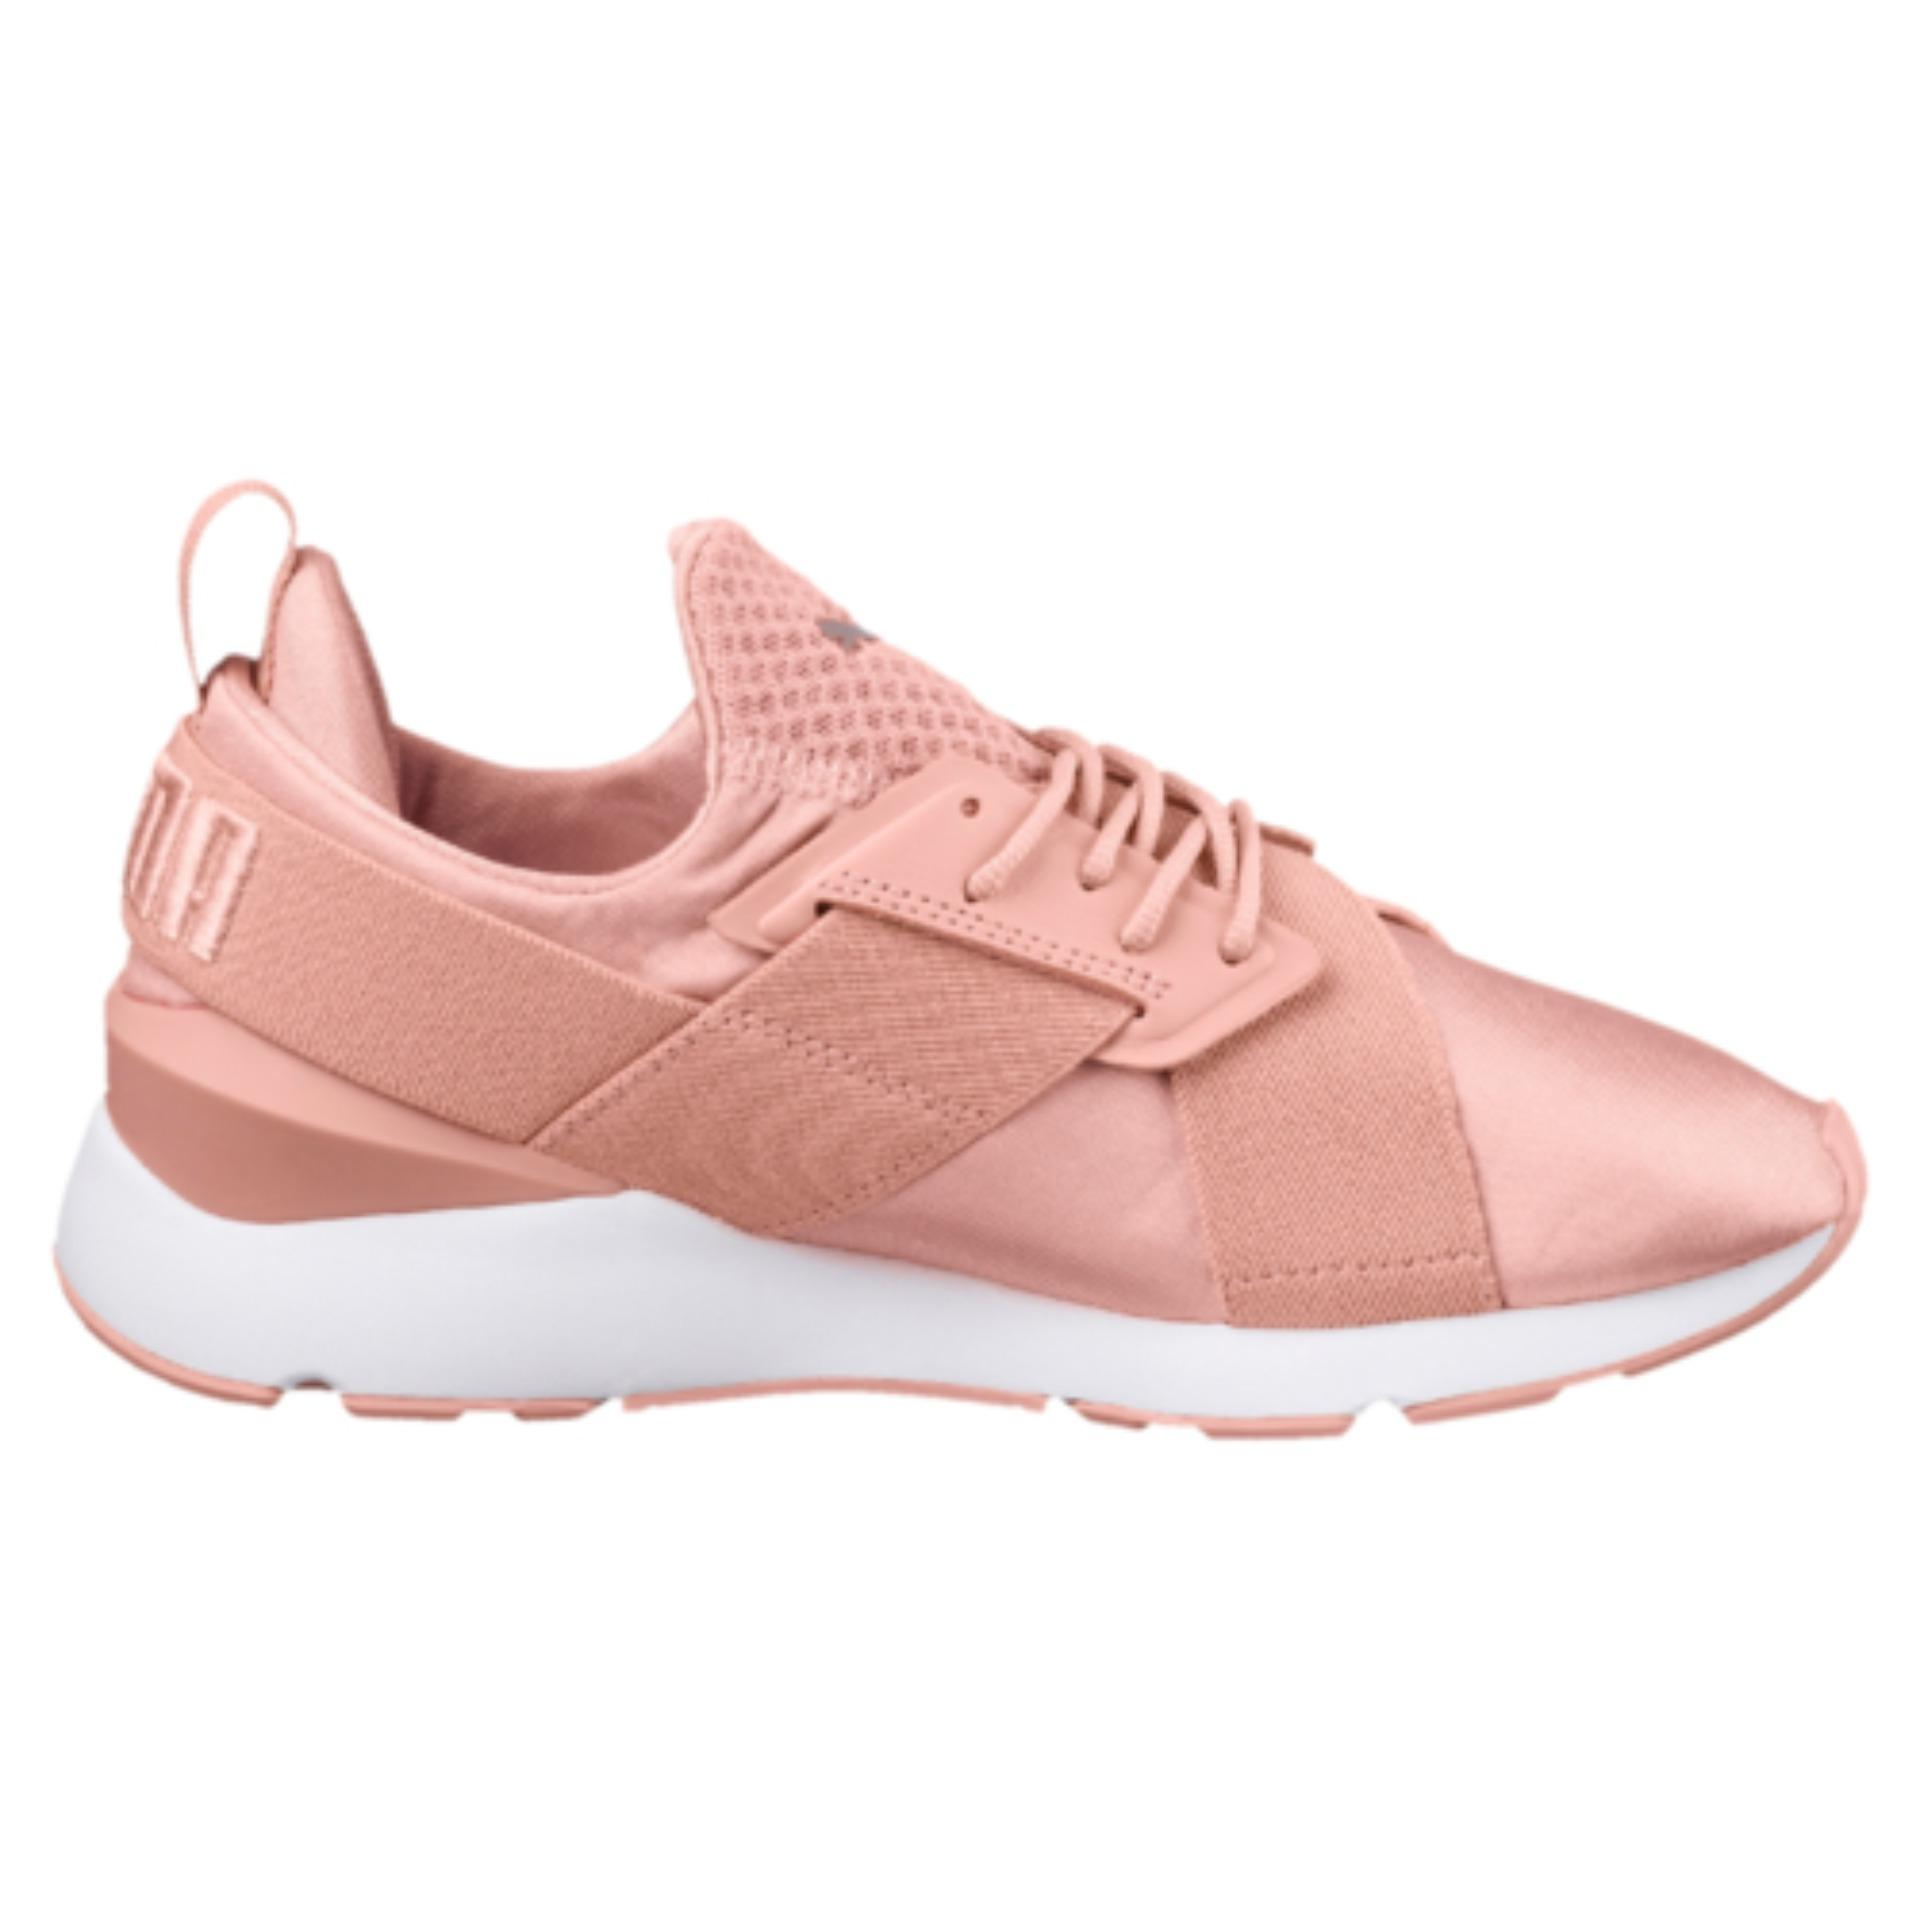 Low Price Puma Muse Satin Ep Women Sneakers Peach Beige Puma Whitepeach Beige Puma White